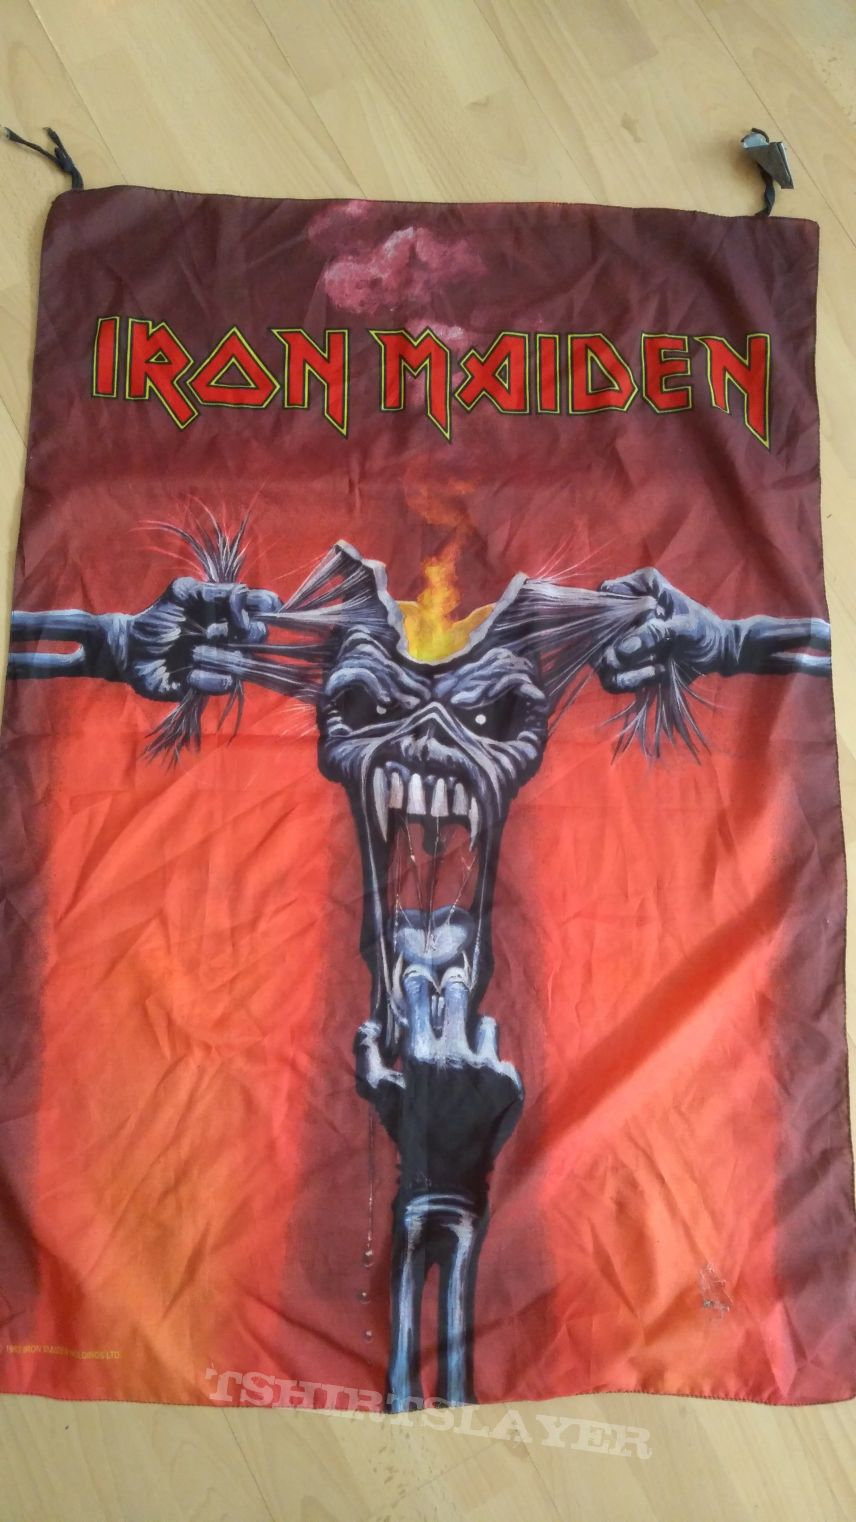 Official iron maiden flag